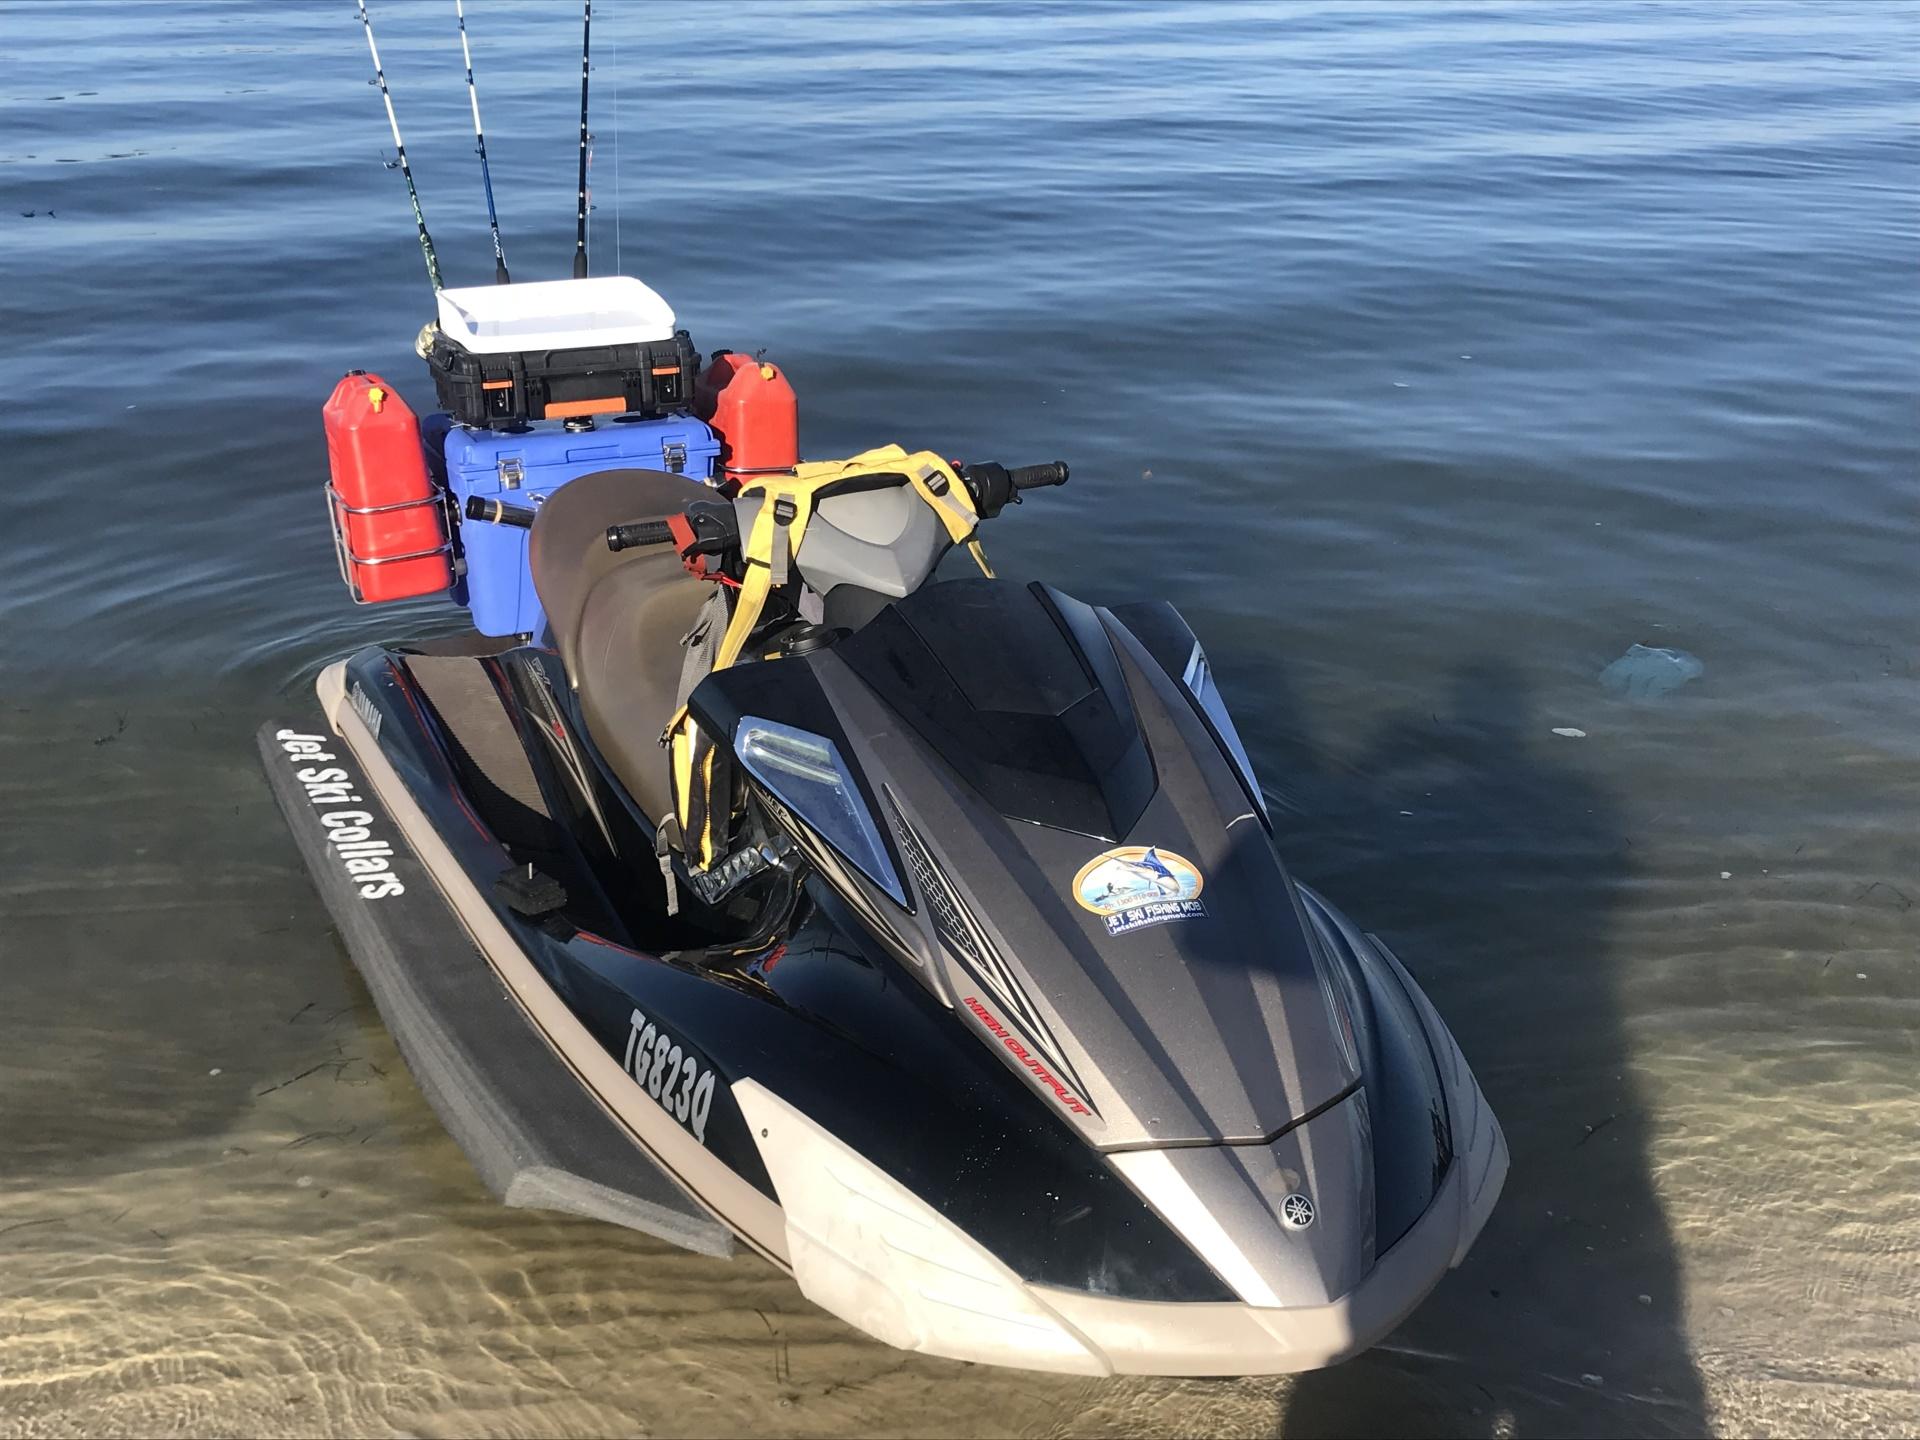 Jet Ski Level Flotation, Jet Ski Collars, Jet Ski Fishing Gear